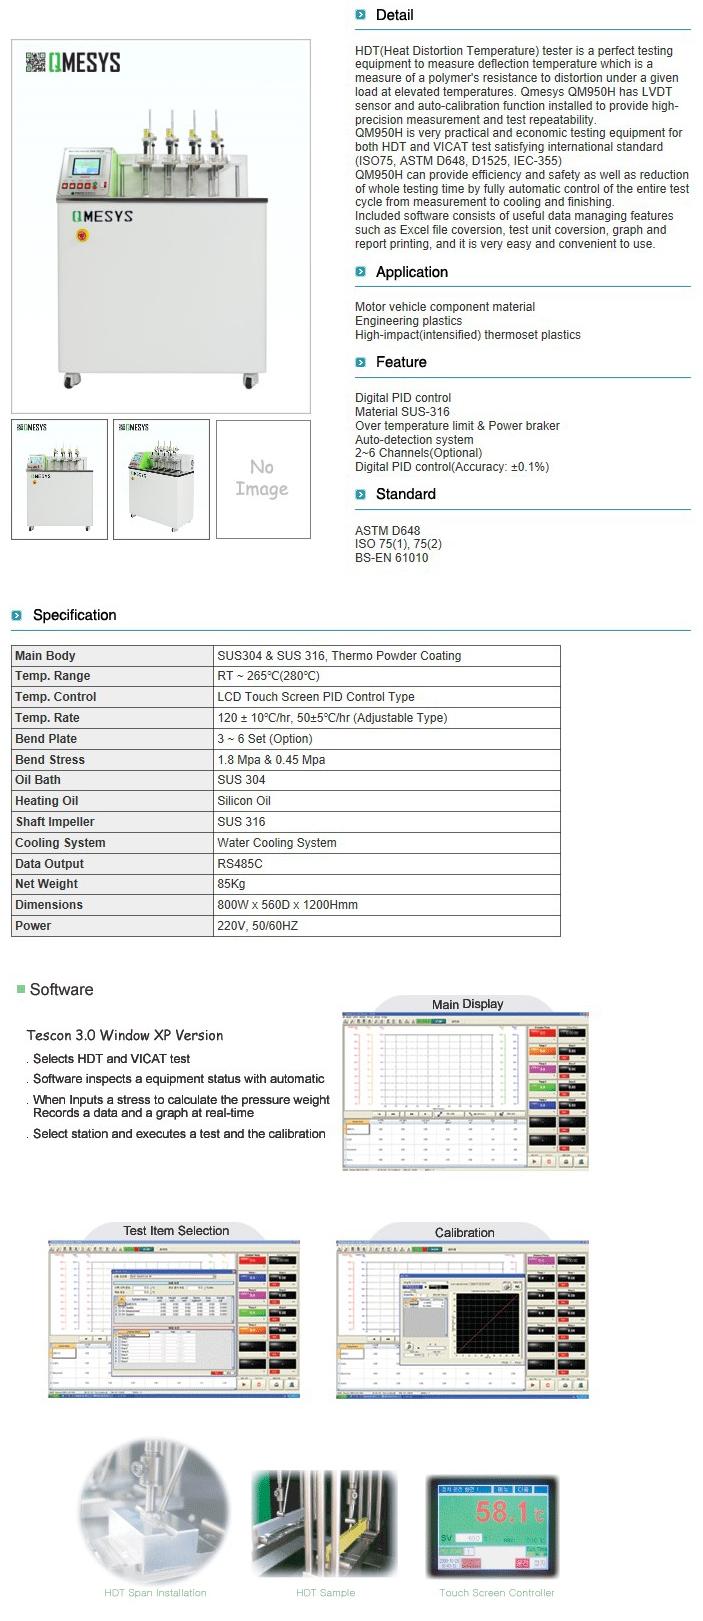 QMESYS Heat Distortion Temperature Tester QM950H